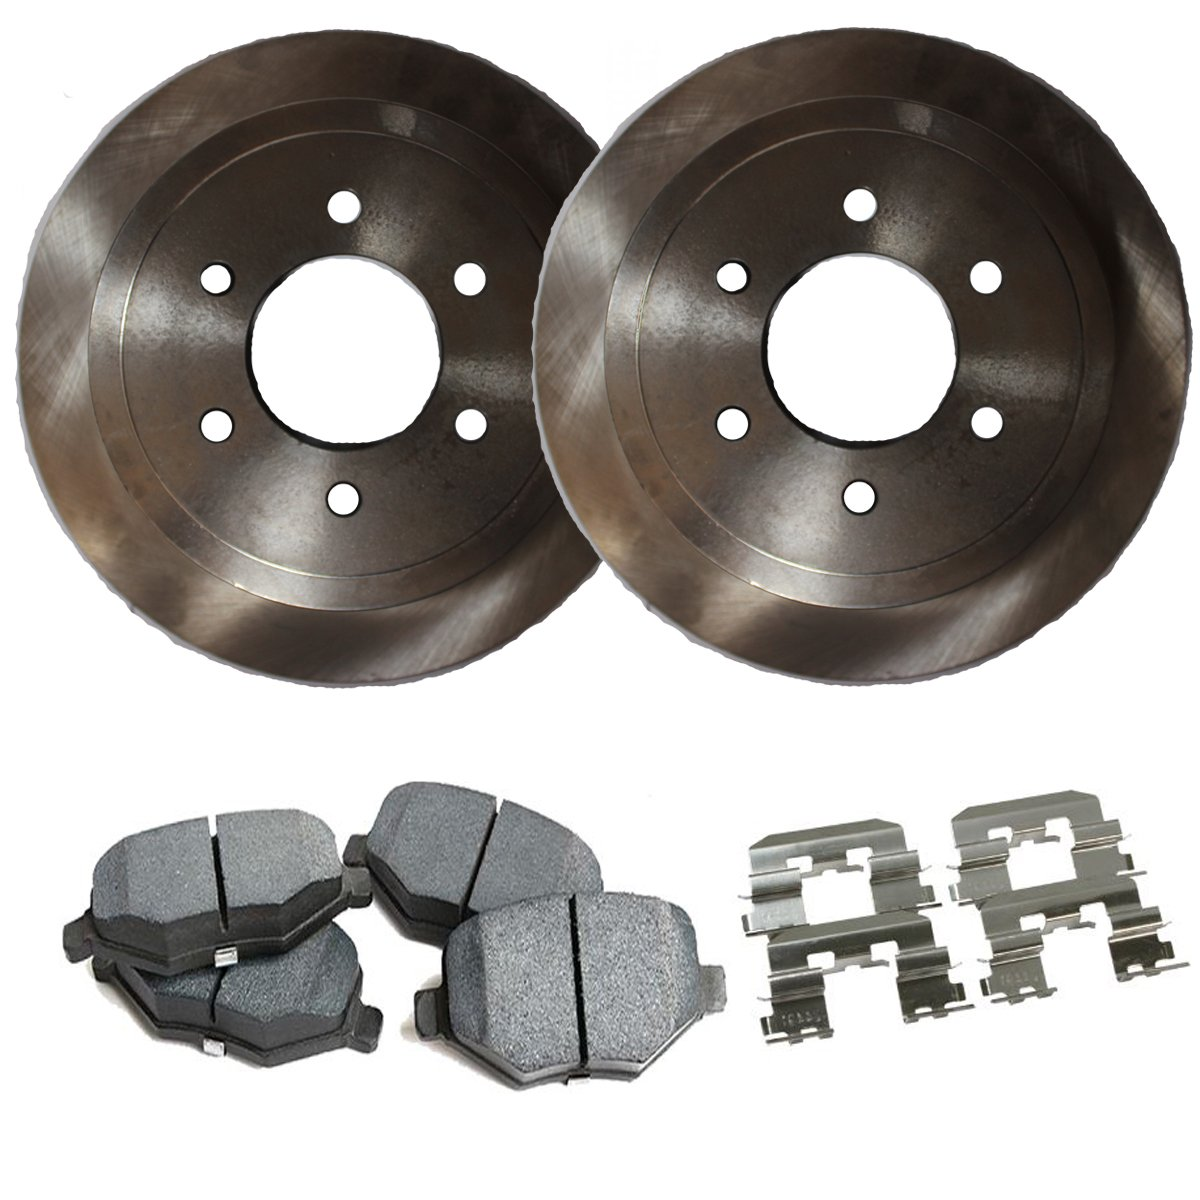 Detroit Axle - Complete Rear Brake Rotor Set & Brake Pads w/Clips Hardware Kit Premium GRADE for 2005-2011 Ford F-150 - [2006-2008 Lincoln Mark LT]